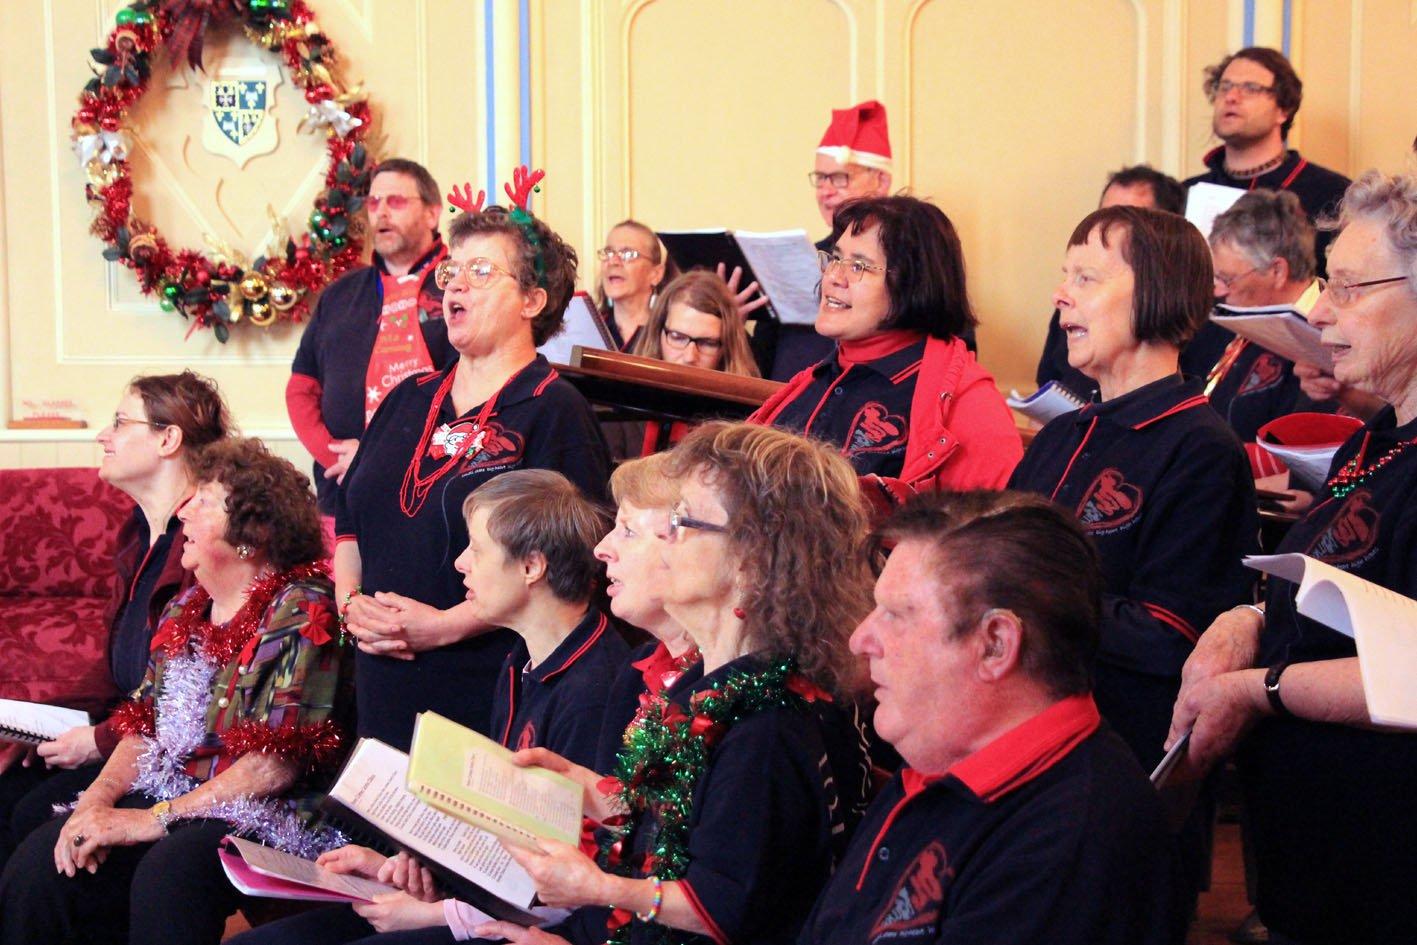 Choir of High Hopes